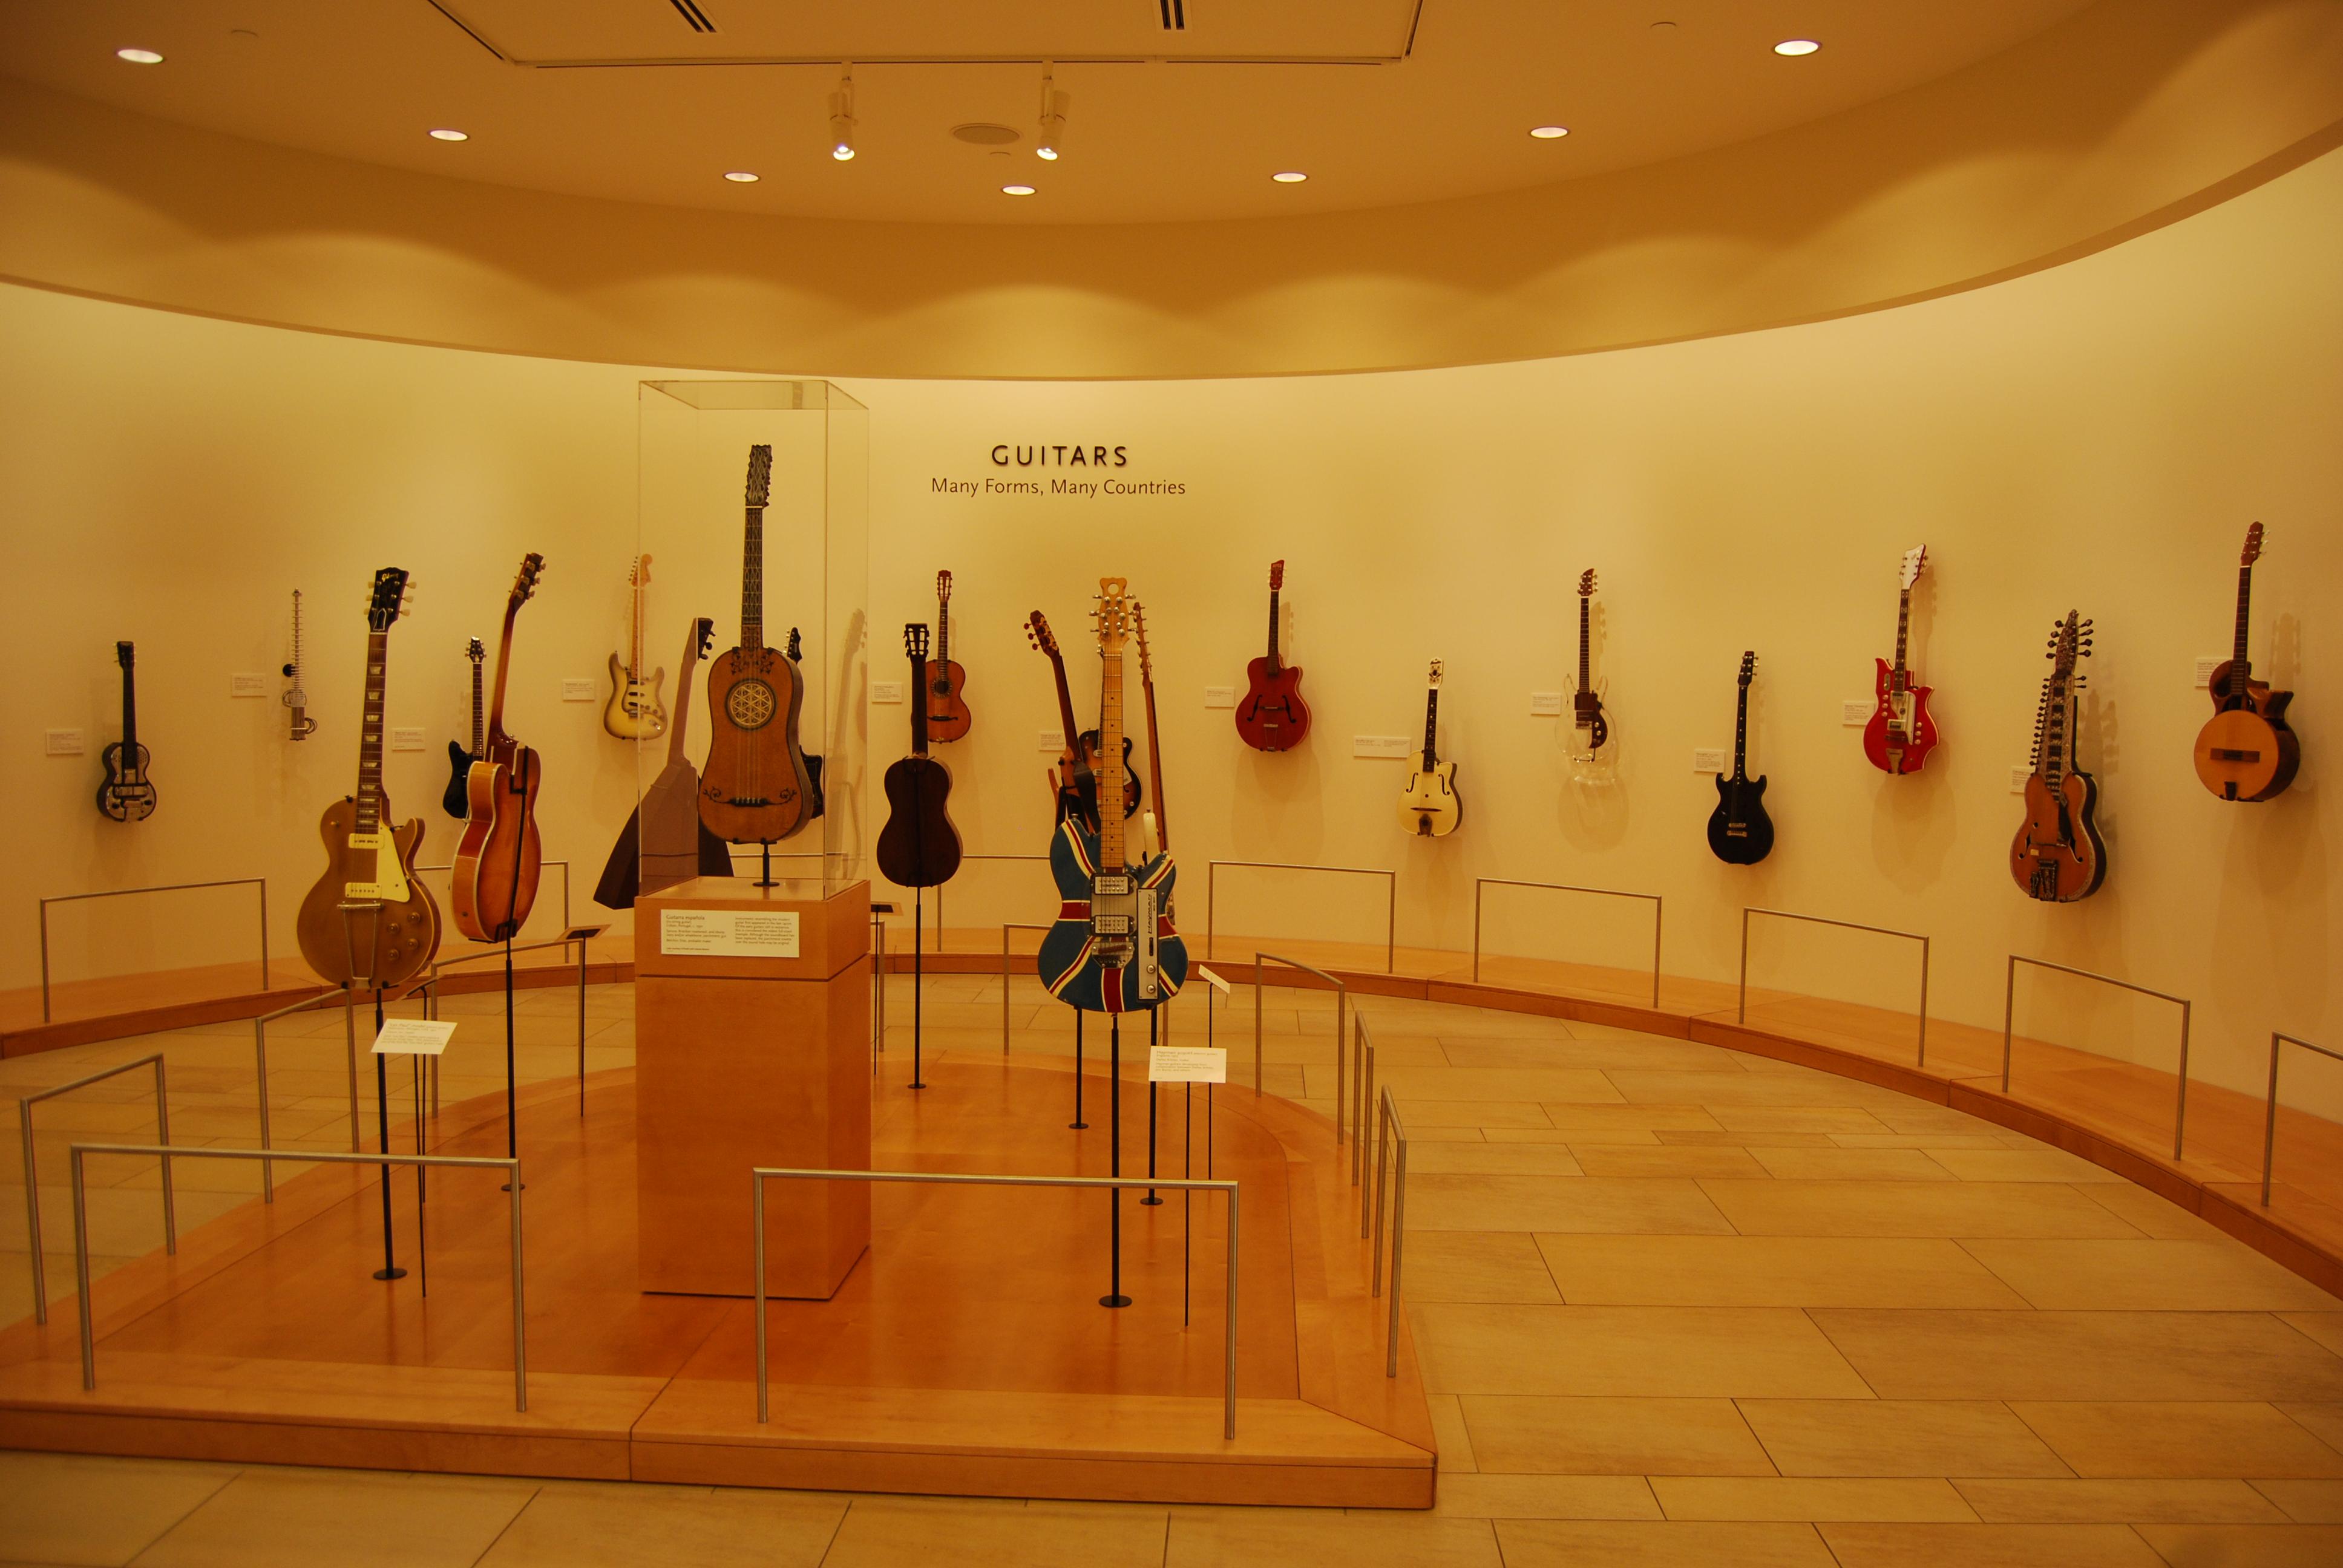 Musical Instrument Museum Guitars